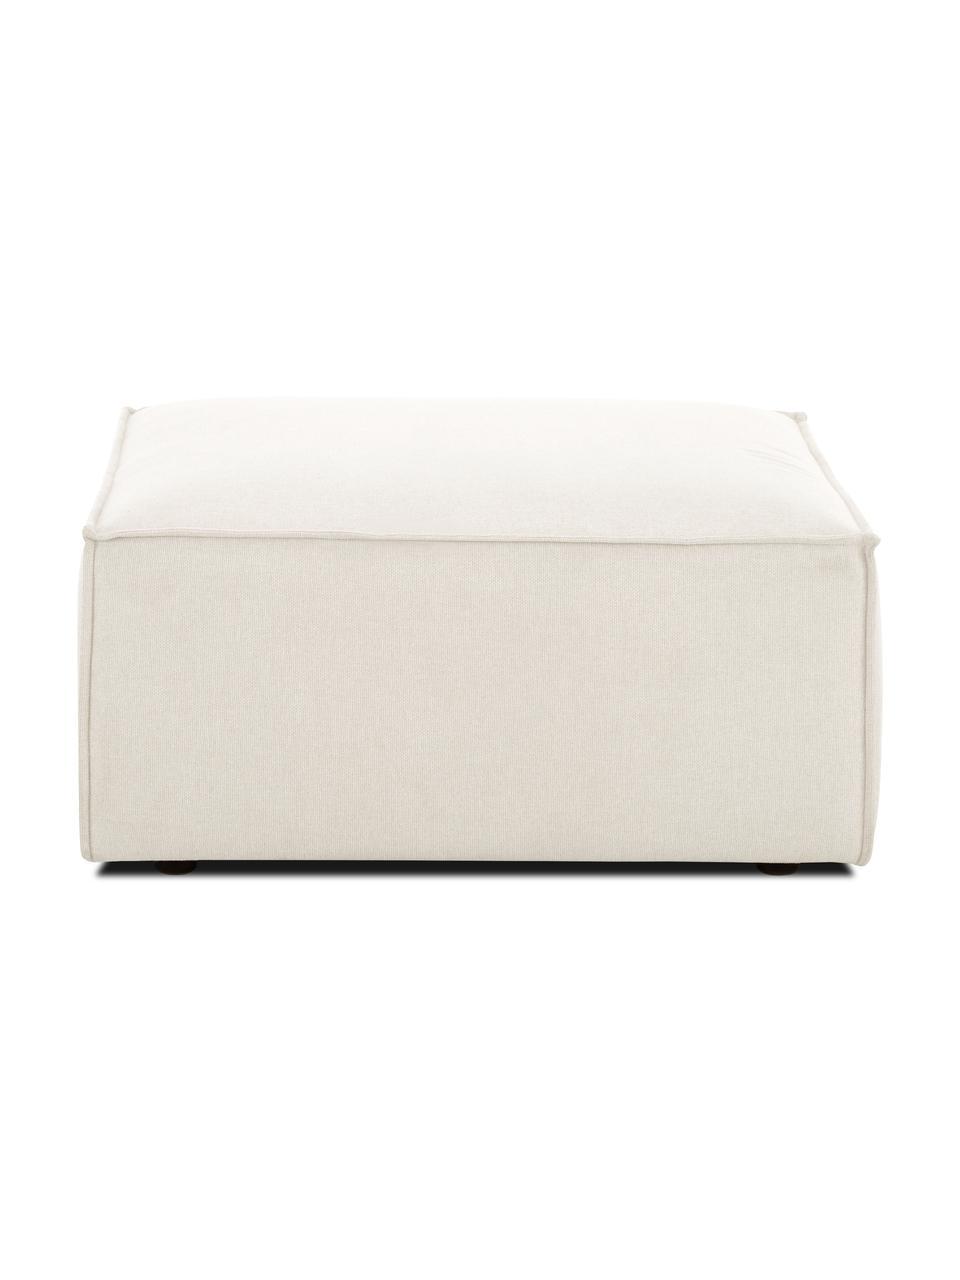 Sofa-Hocker Lennon in Beige, Bezug: Polyester Der hochwertige, Gestell: Massives Kiefernholz, Spe, Füße: Kunststoff Die Füße befin, Webstoff Beige, 88 x 43 cm